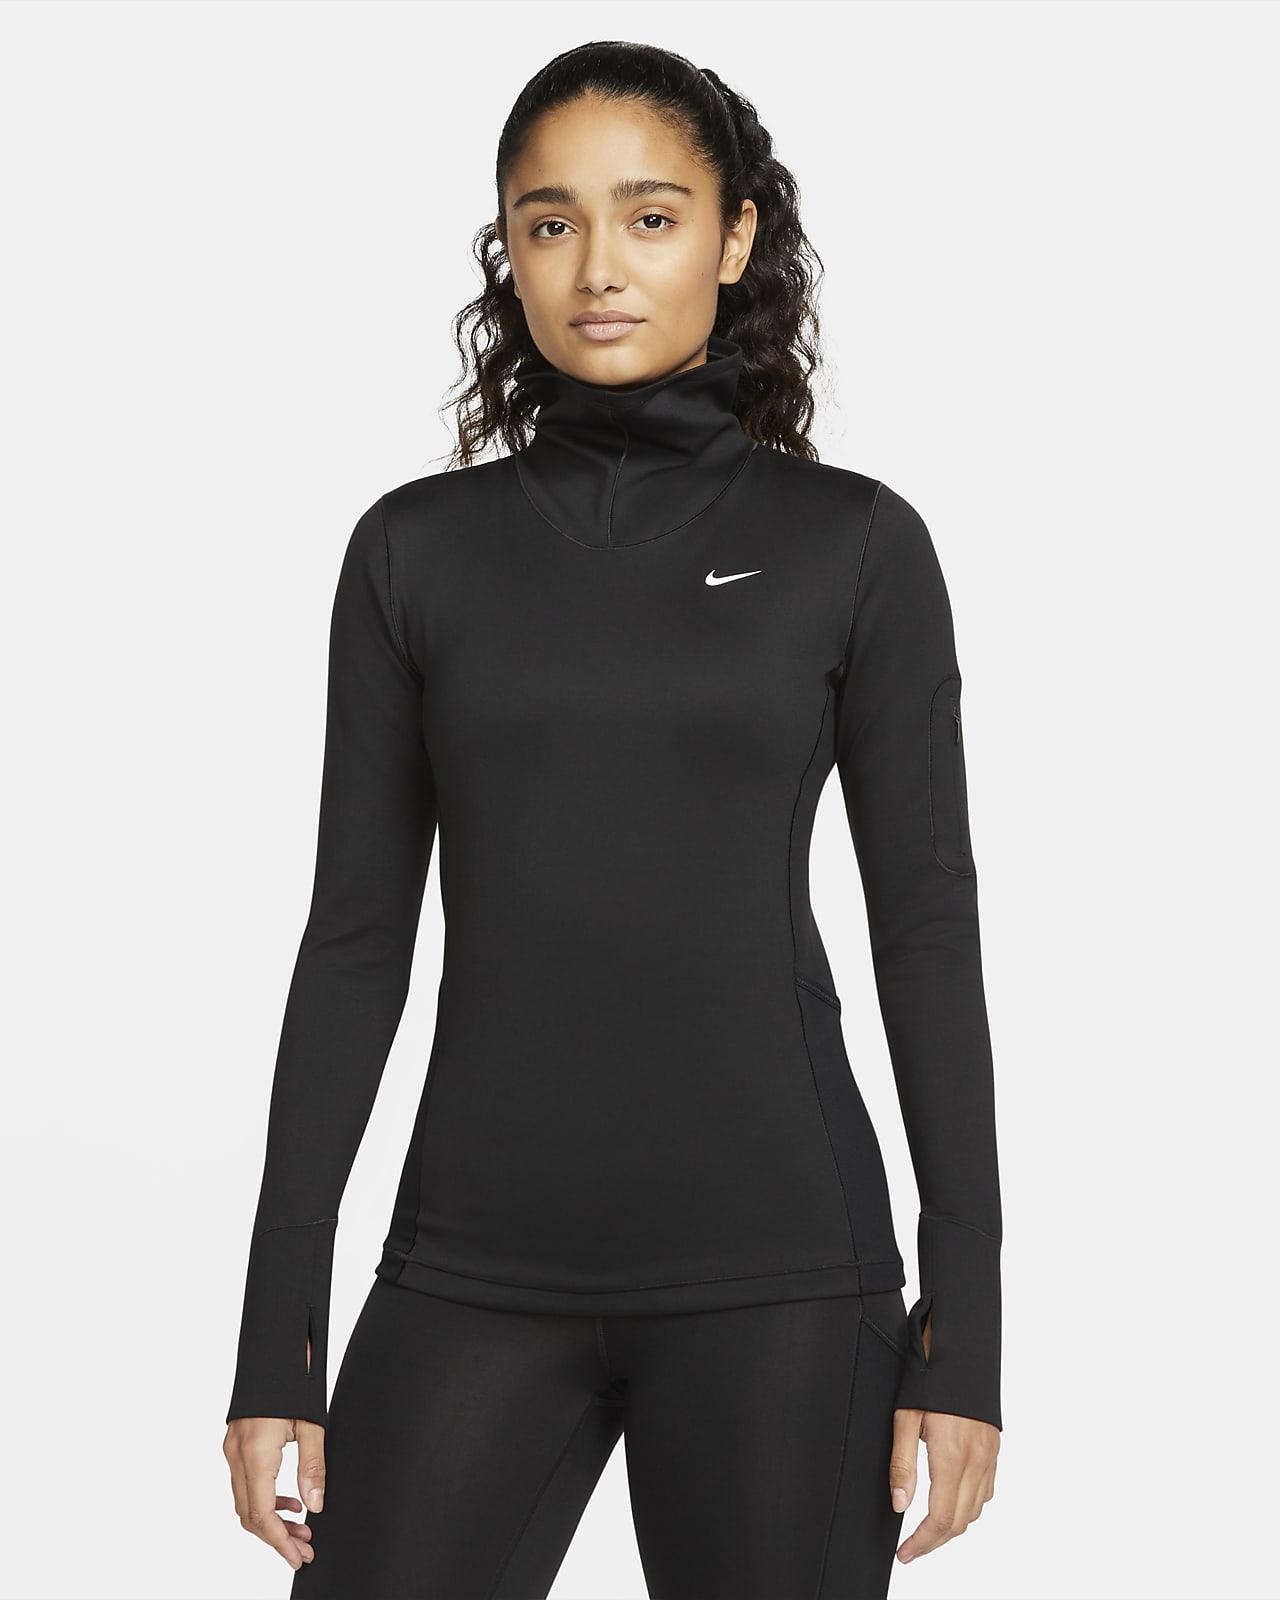 Prenda para la parte superior de manga larga para mujer Nike Pro Therma-FIT